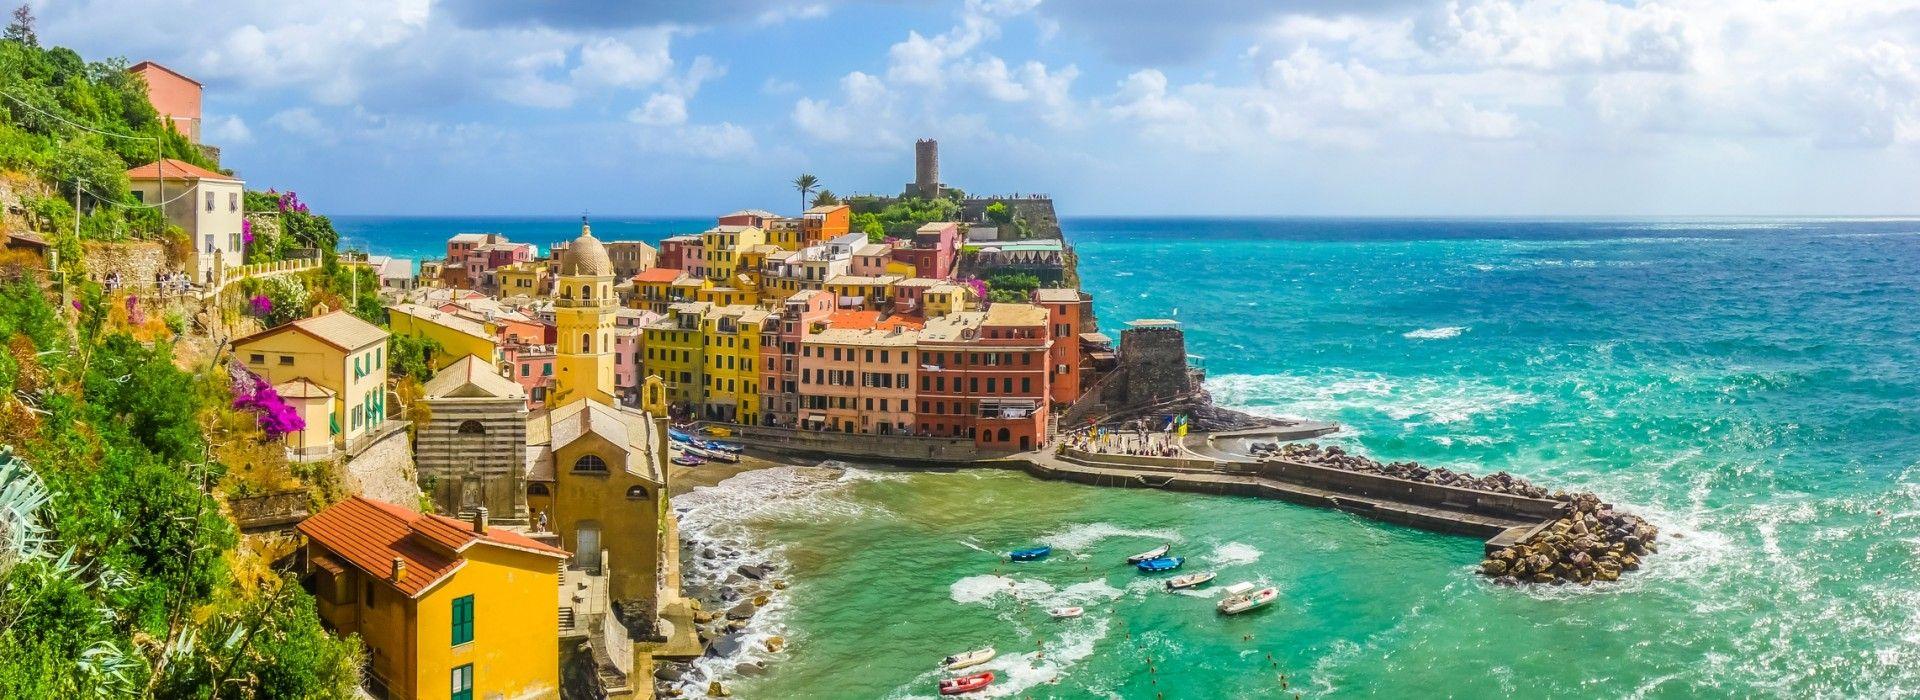 Food, wine, events and nightlife Tours in Amalfi Coast & Campania